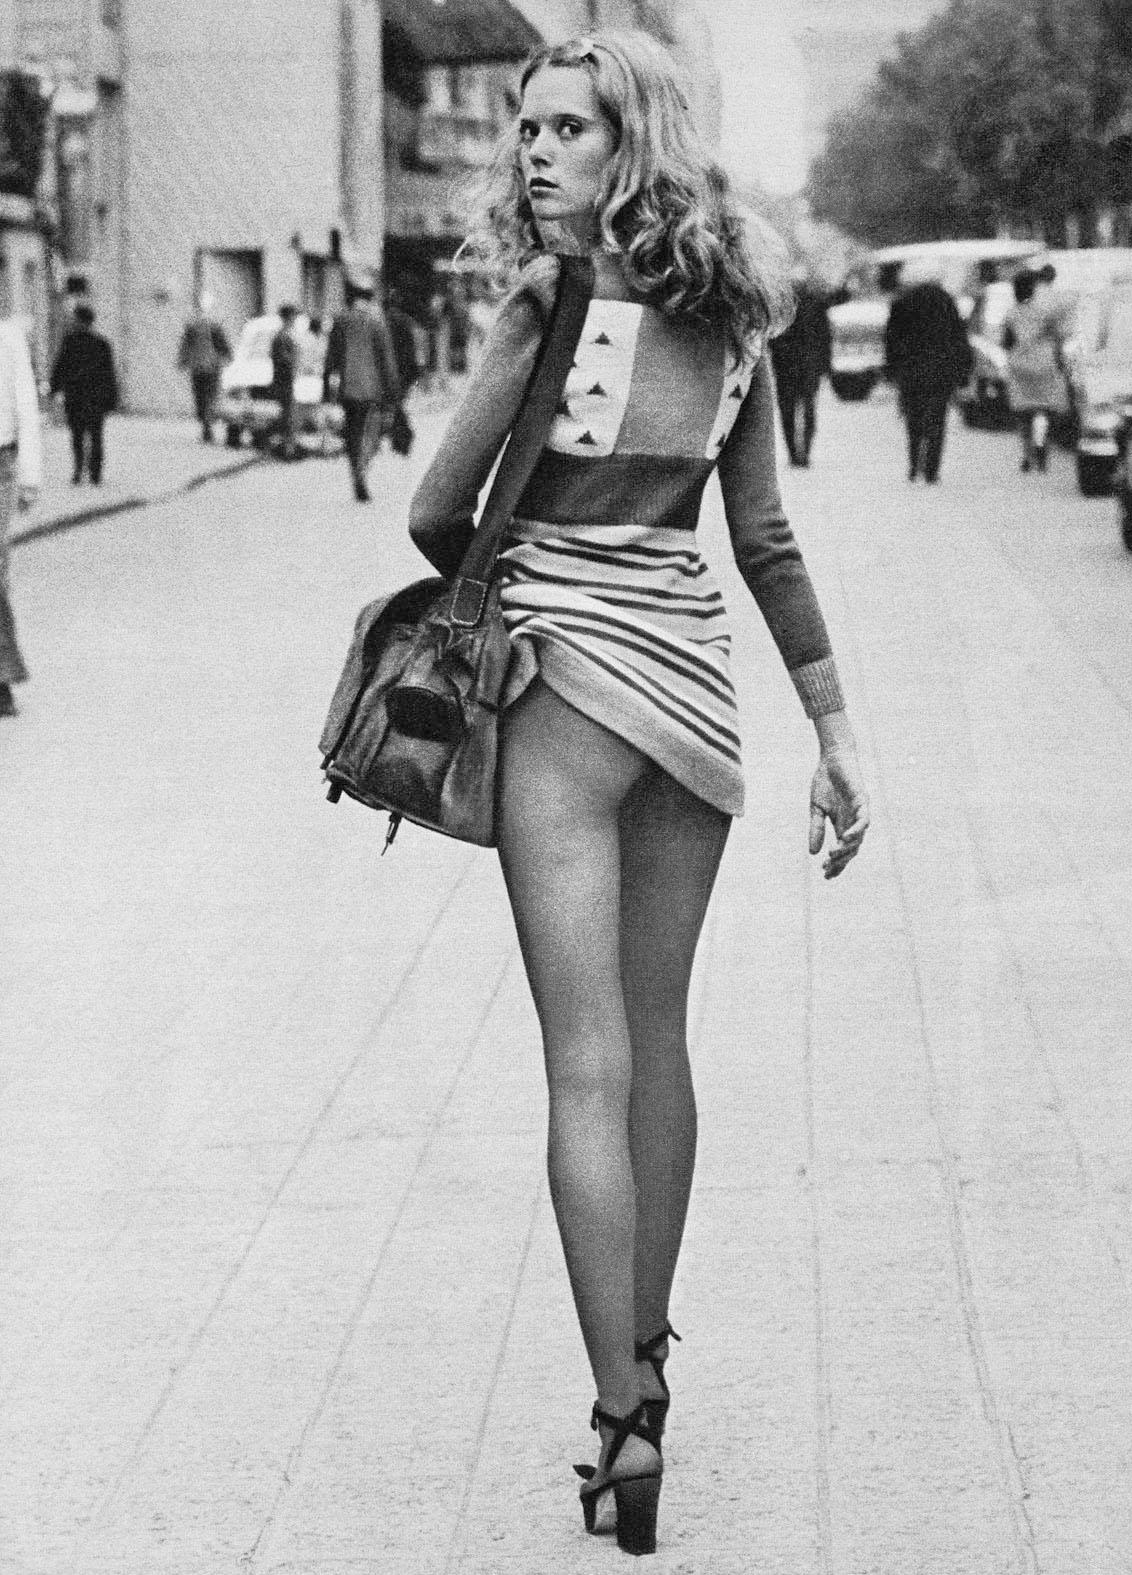 Alice Springs, Fashion for Dépeche Mode, Paris 1971, copyright Alice Springs, courtesy Helmut Newton Foundation